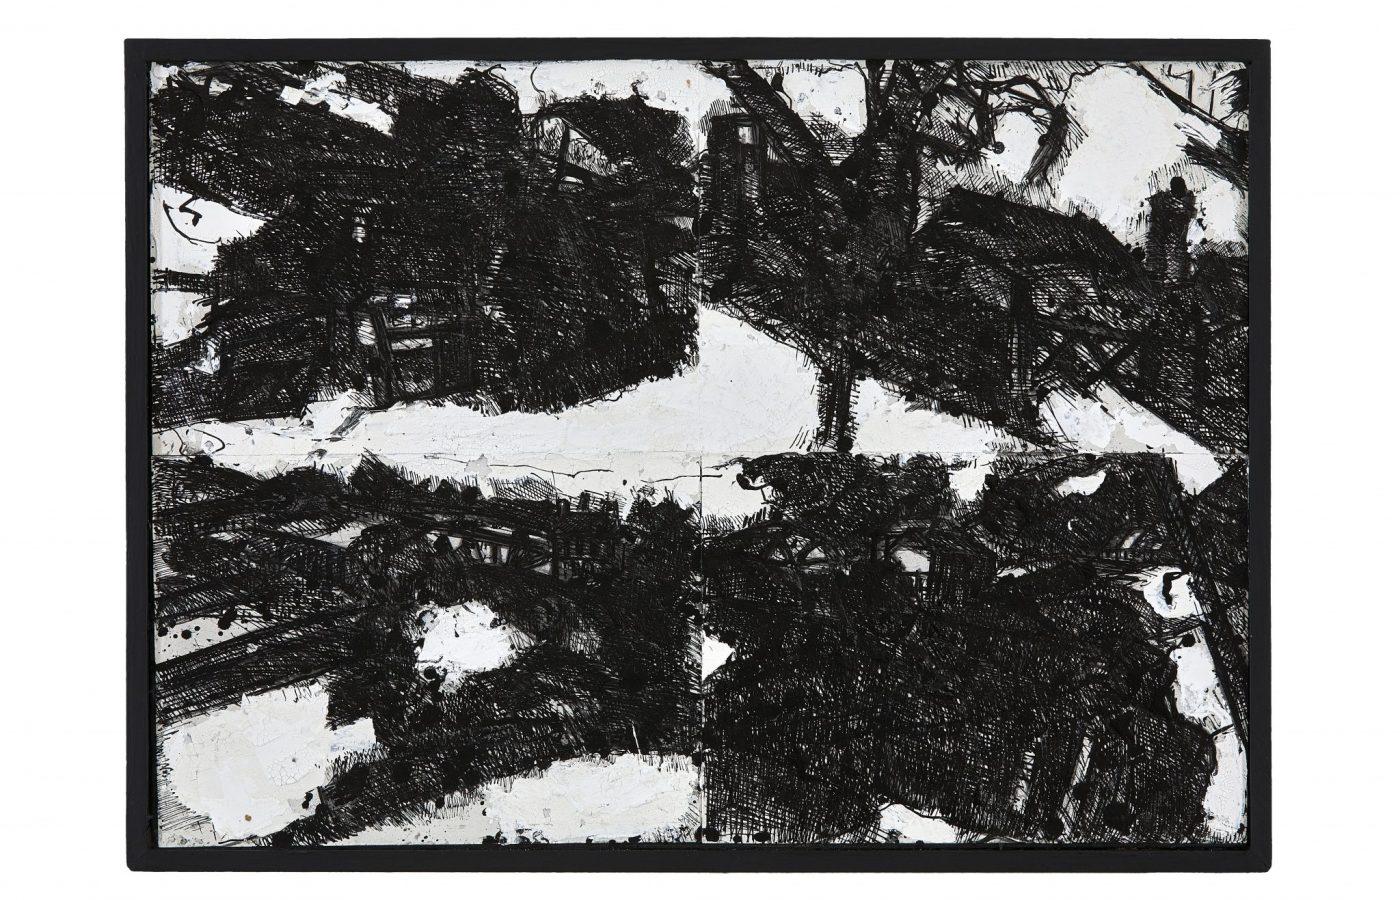 FXF18-12 John Virtue Landscape No 115 1990-91